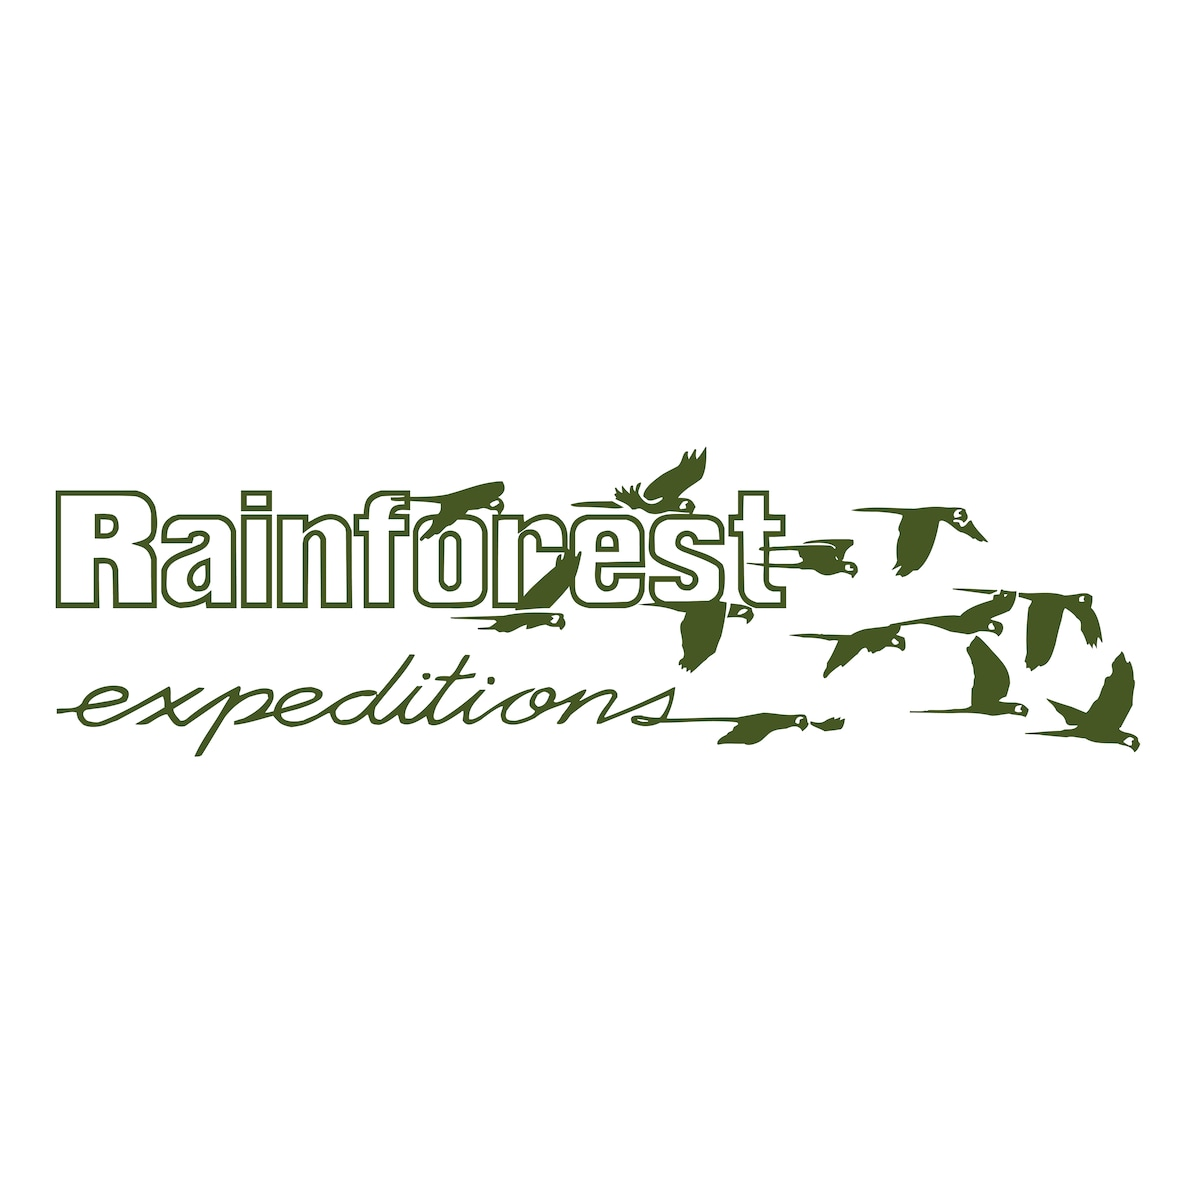 Rainforest from Puerto Maldonado